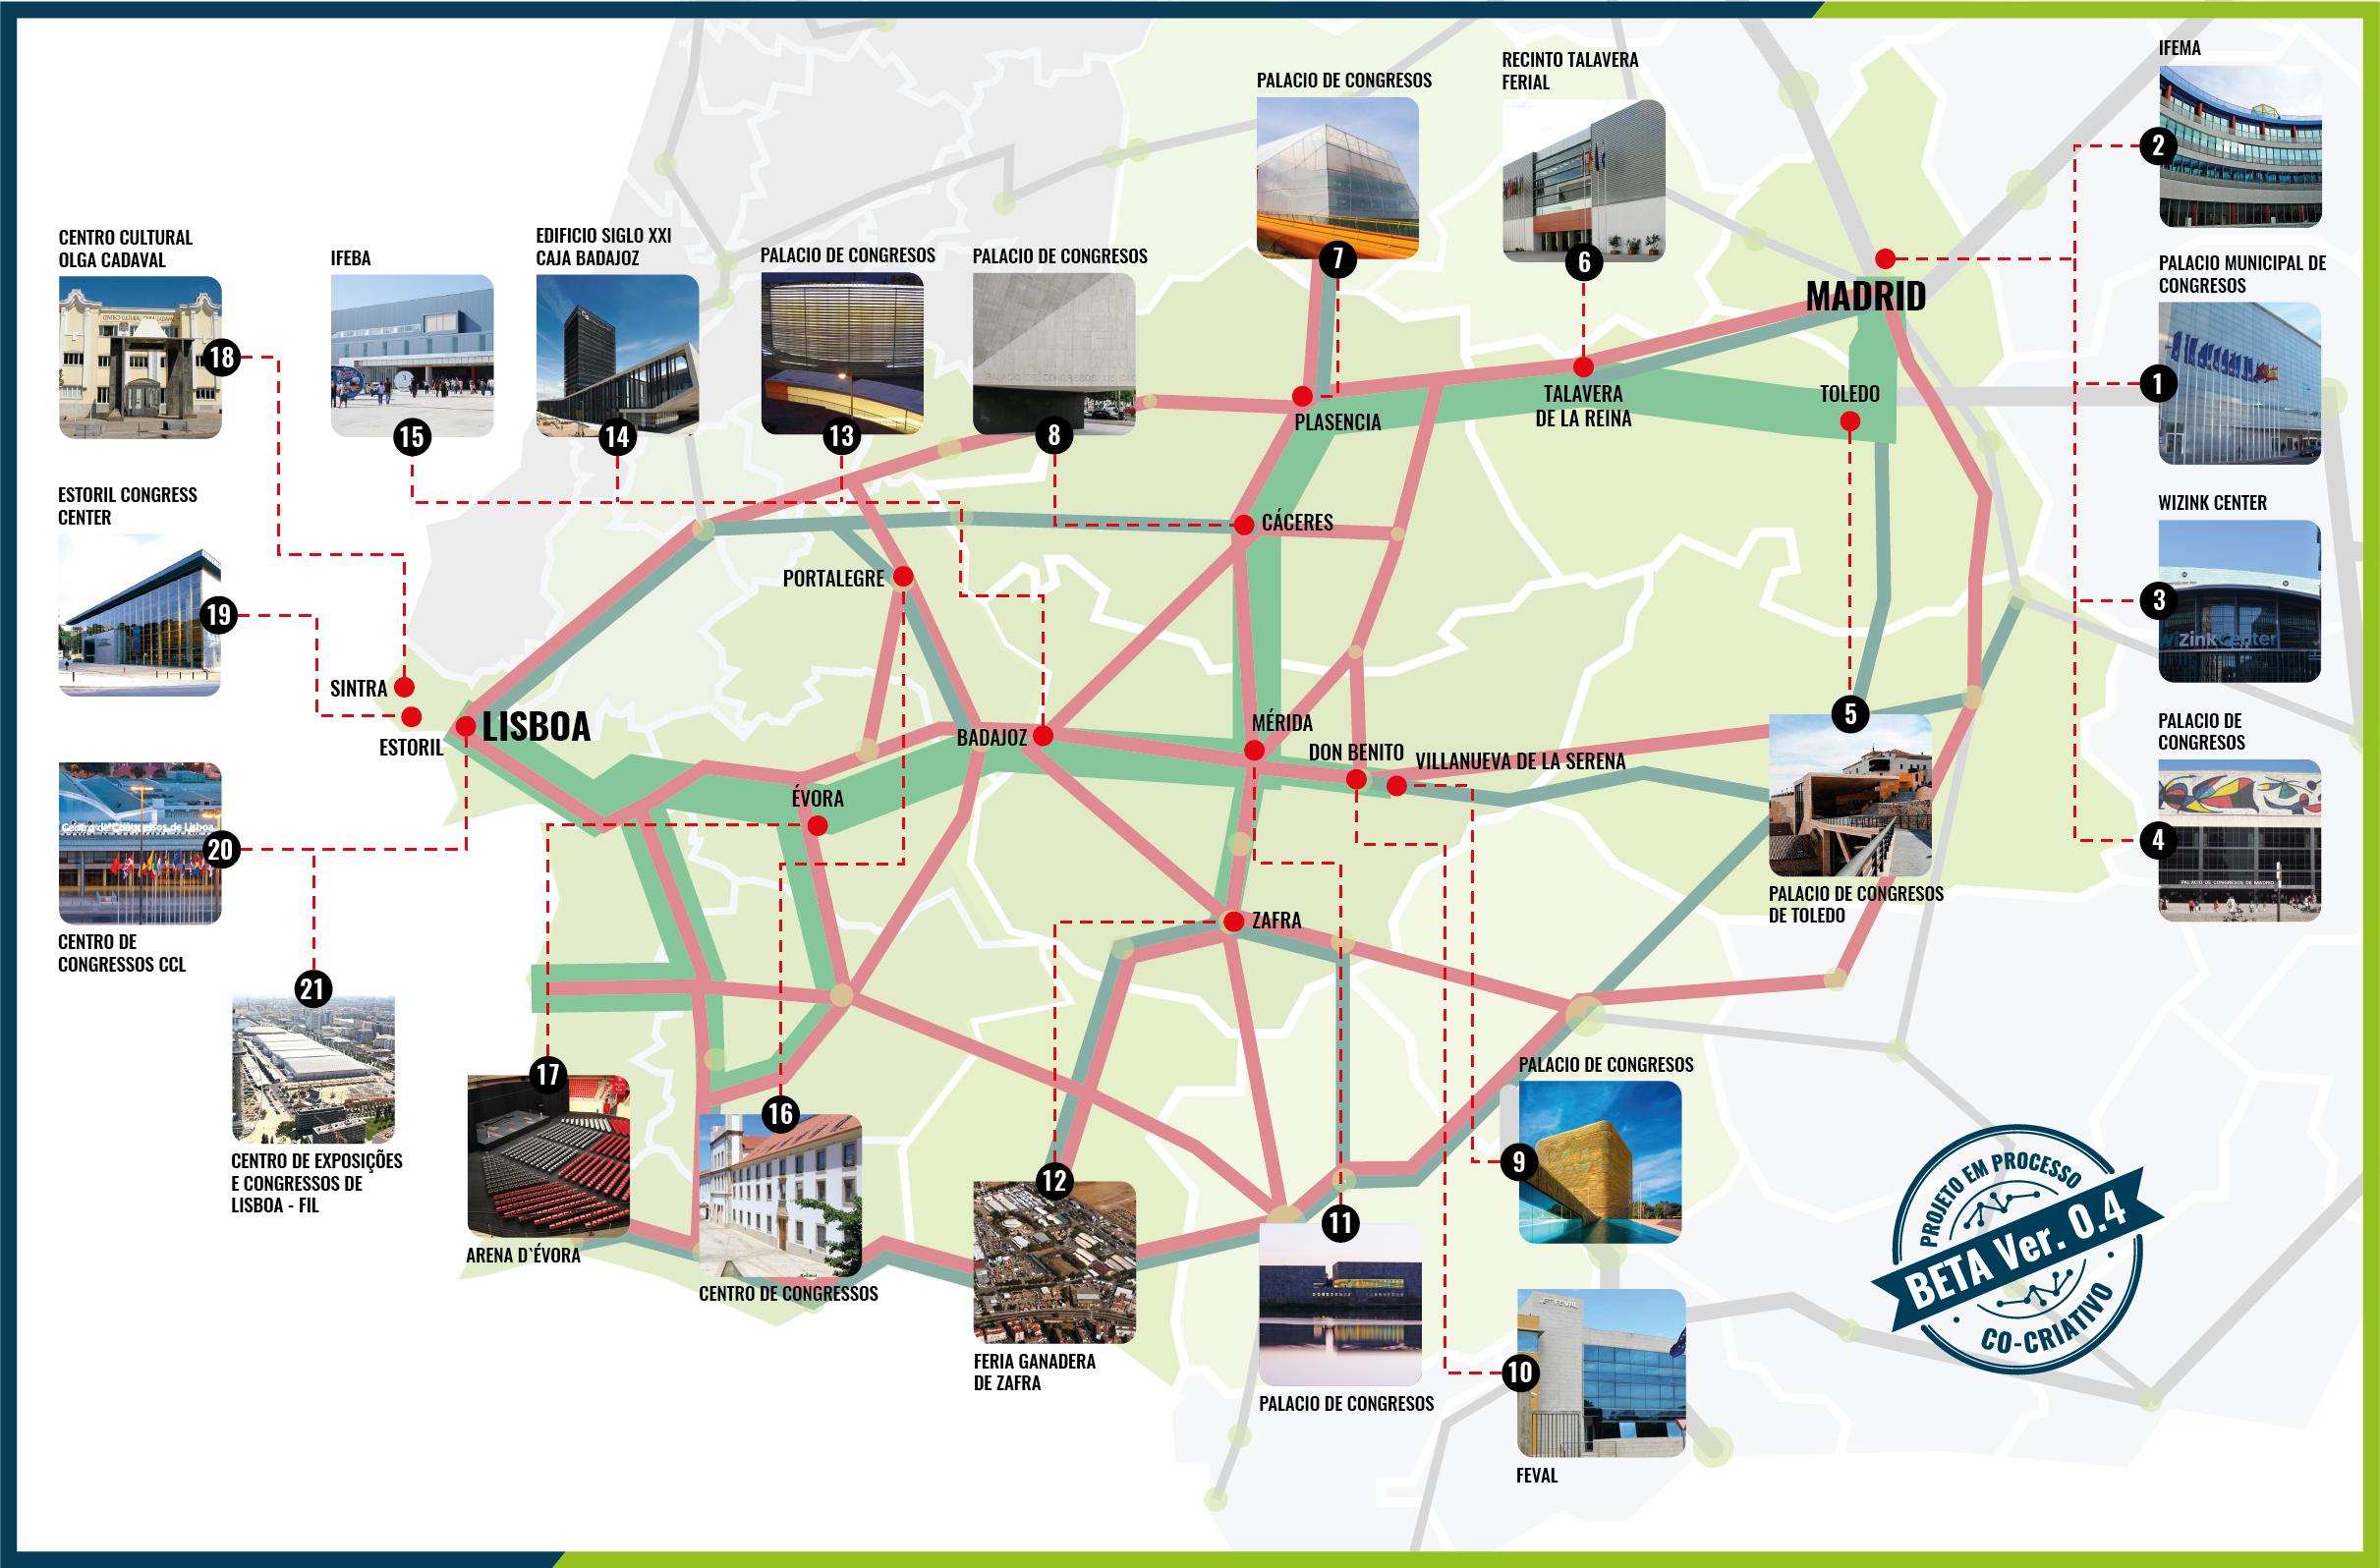 corredor infraestructuras de congresos